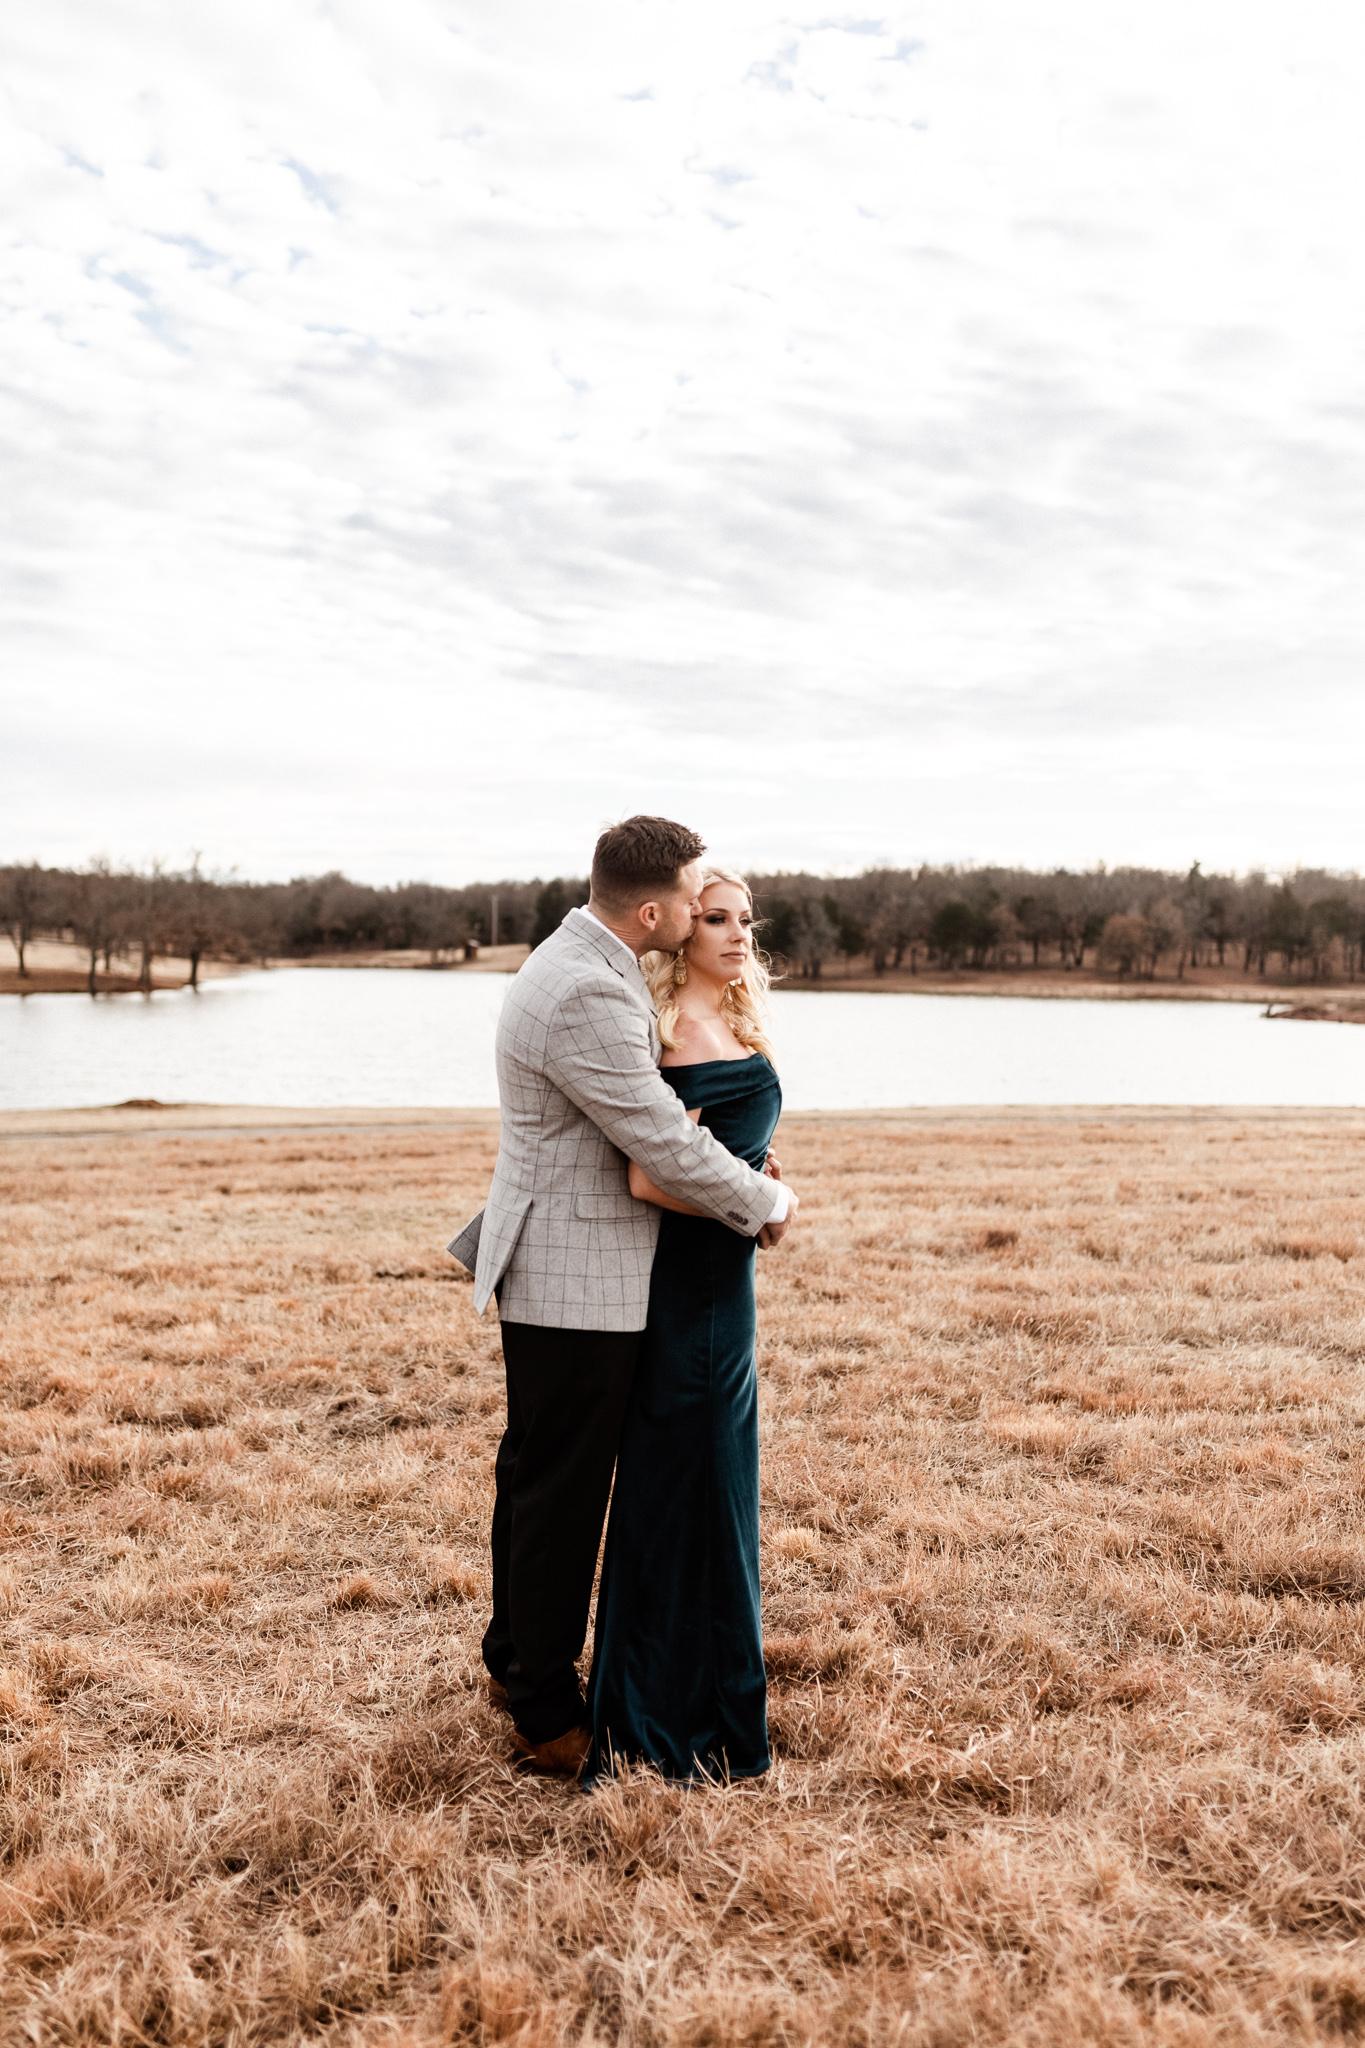 Wade + Stephanie | Warm Open Field Engagements | Oklahoma Wedding Photographer-15.jpg